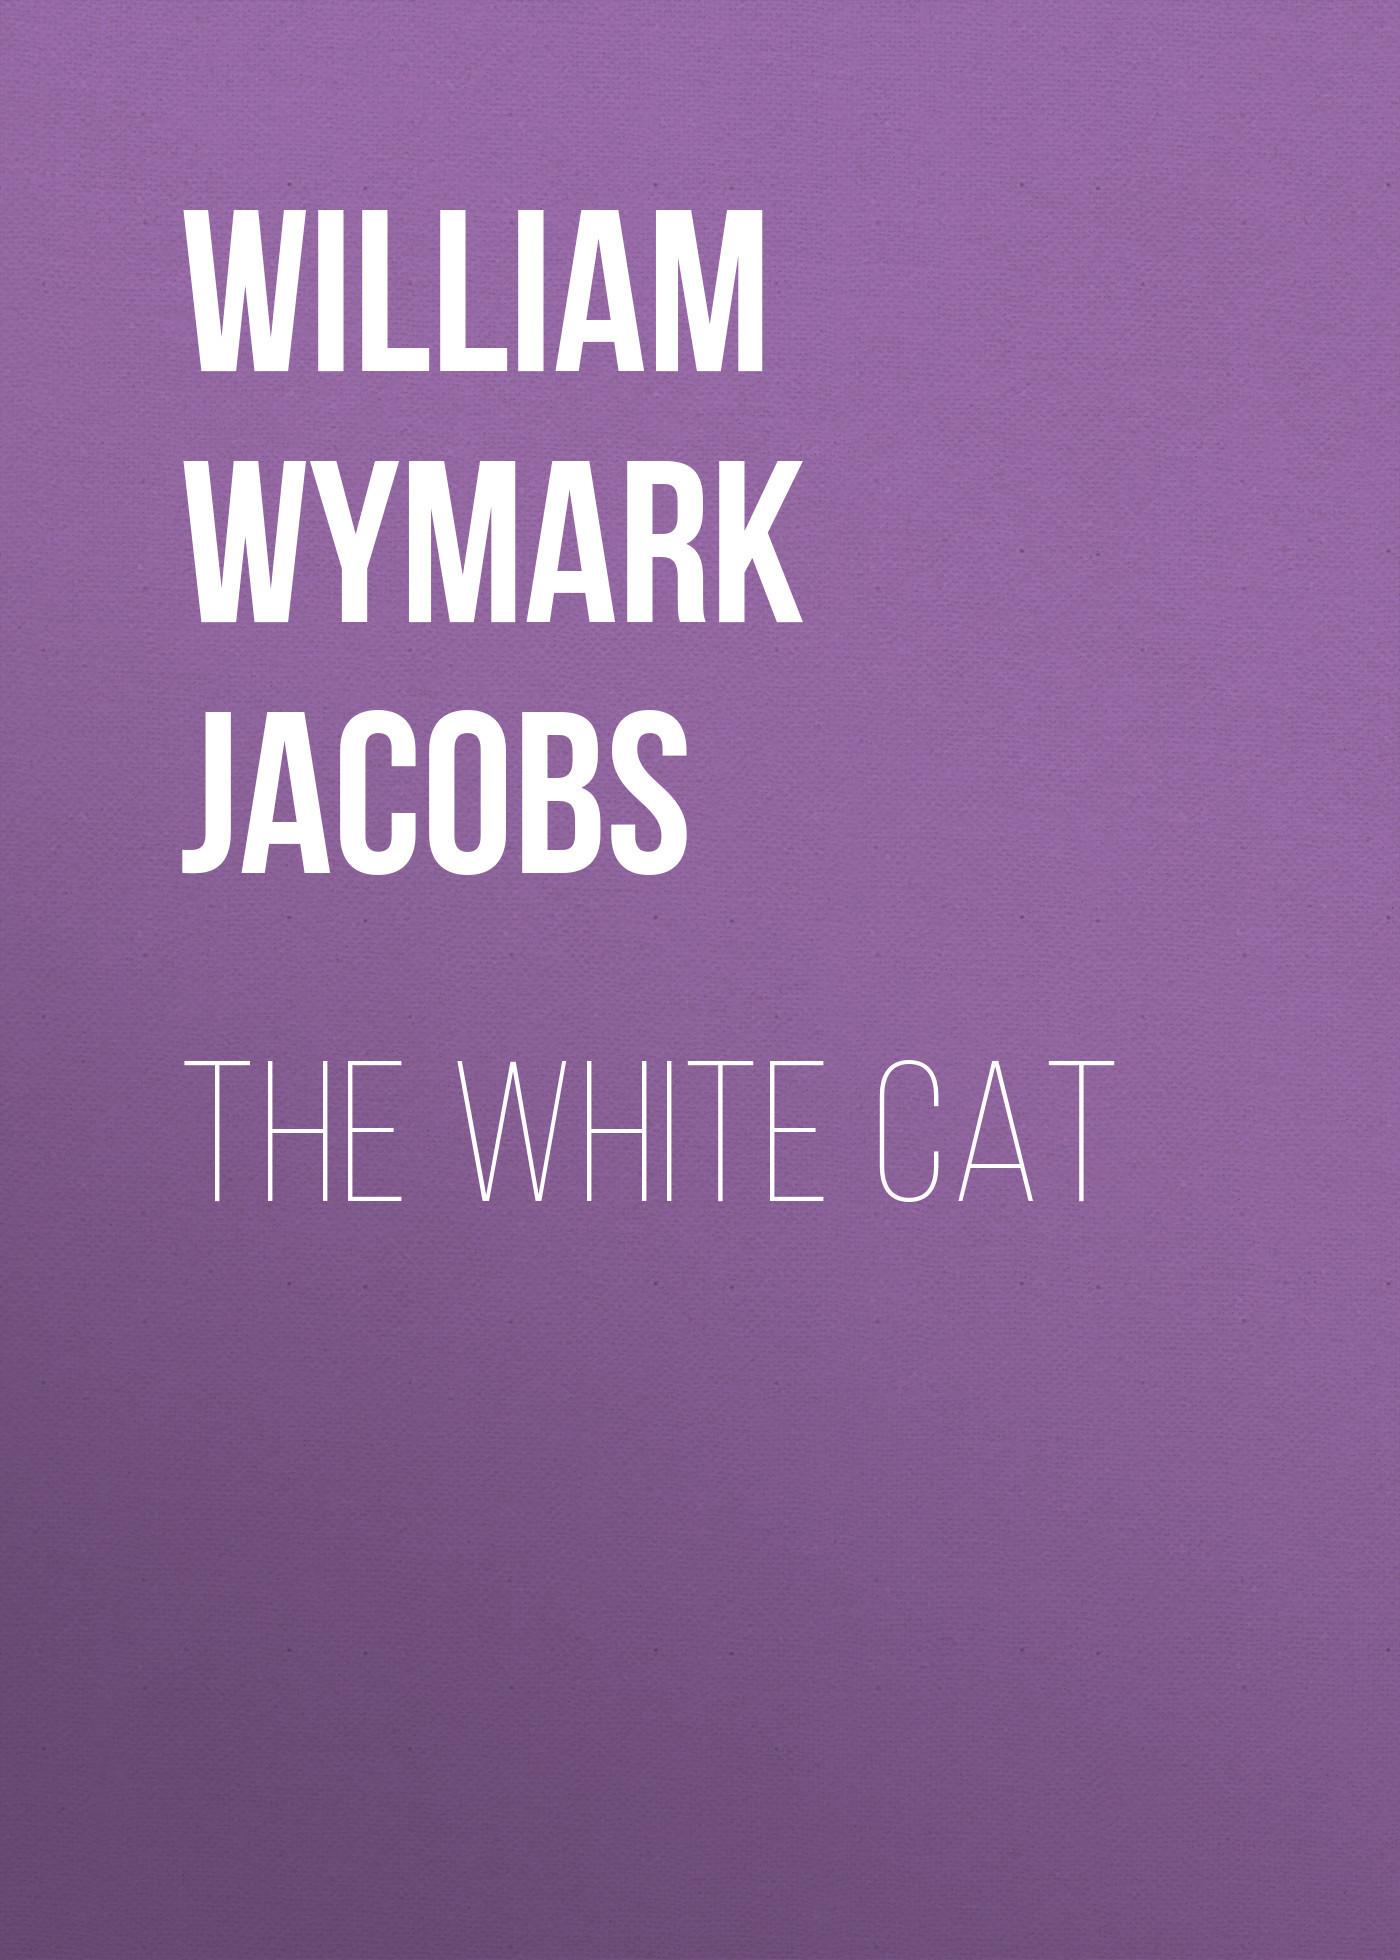 William Wymark Jacobs The White Cat white simulation cat toy polyethylene